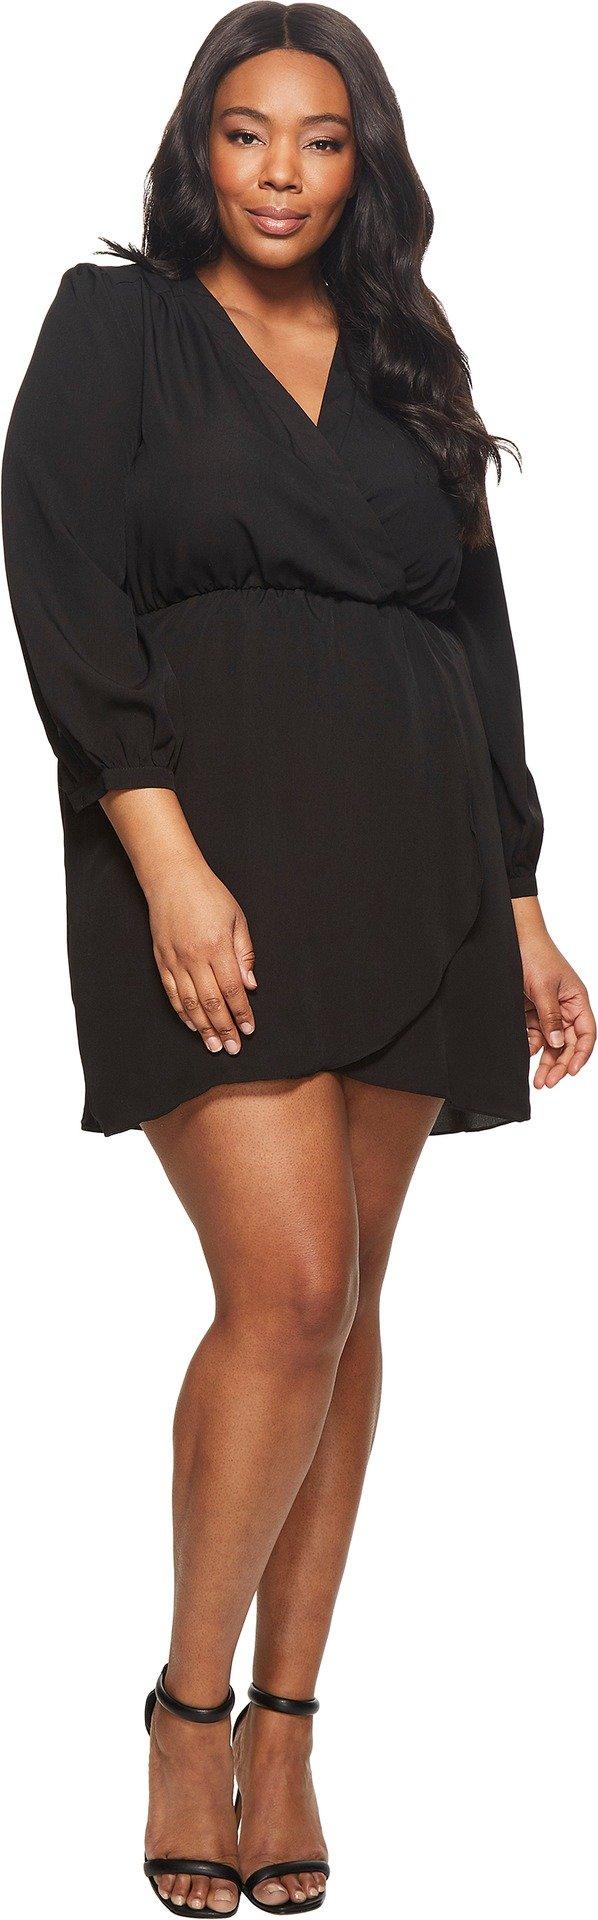 KARI LYN Womens Plus Size Demri Dress